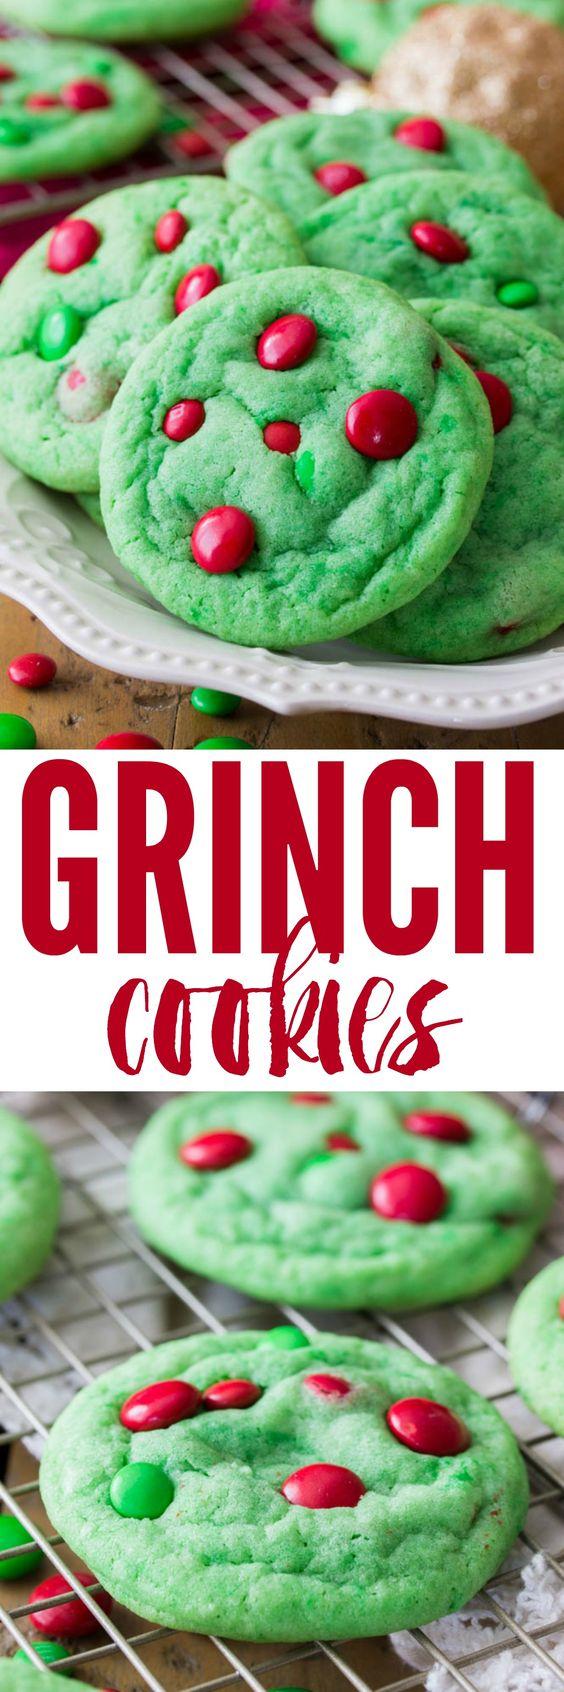 7 Grinch Cookies